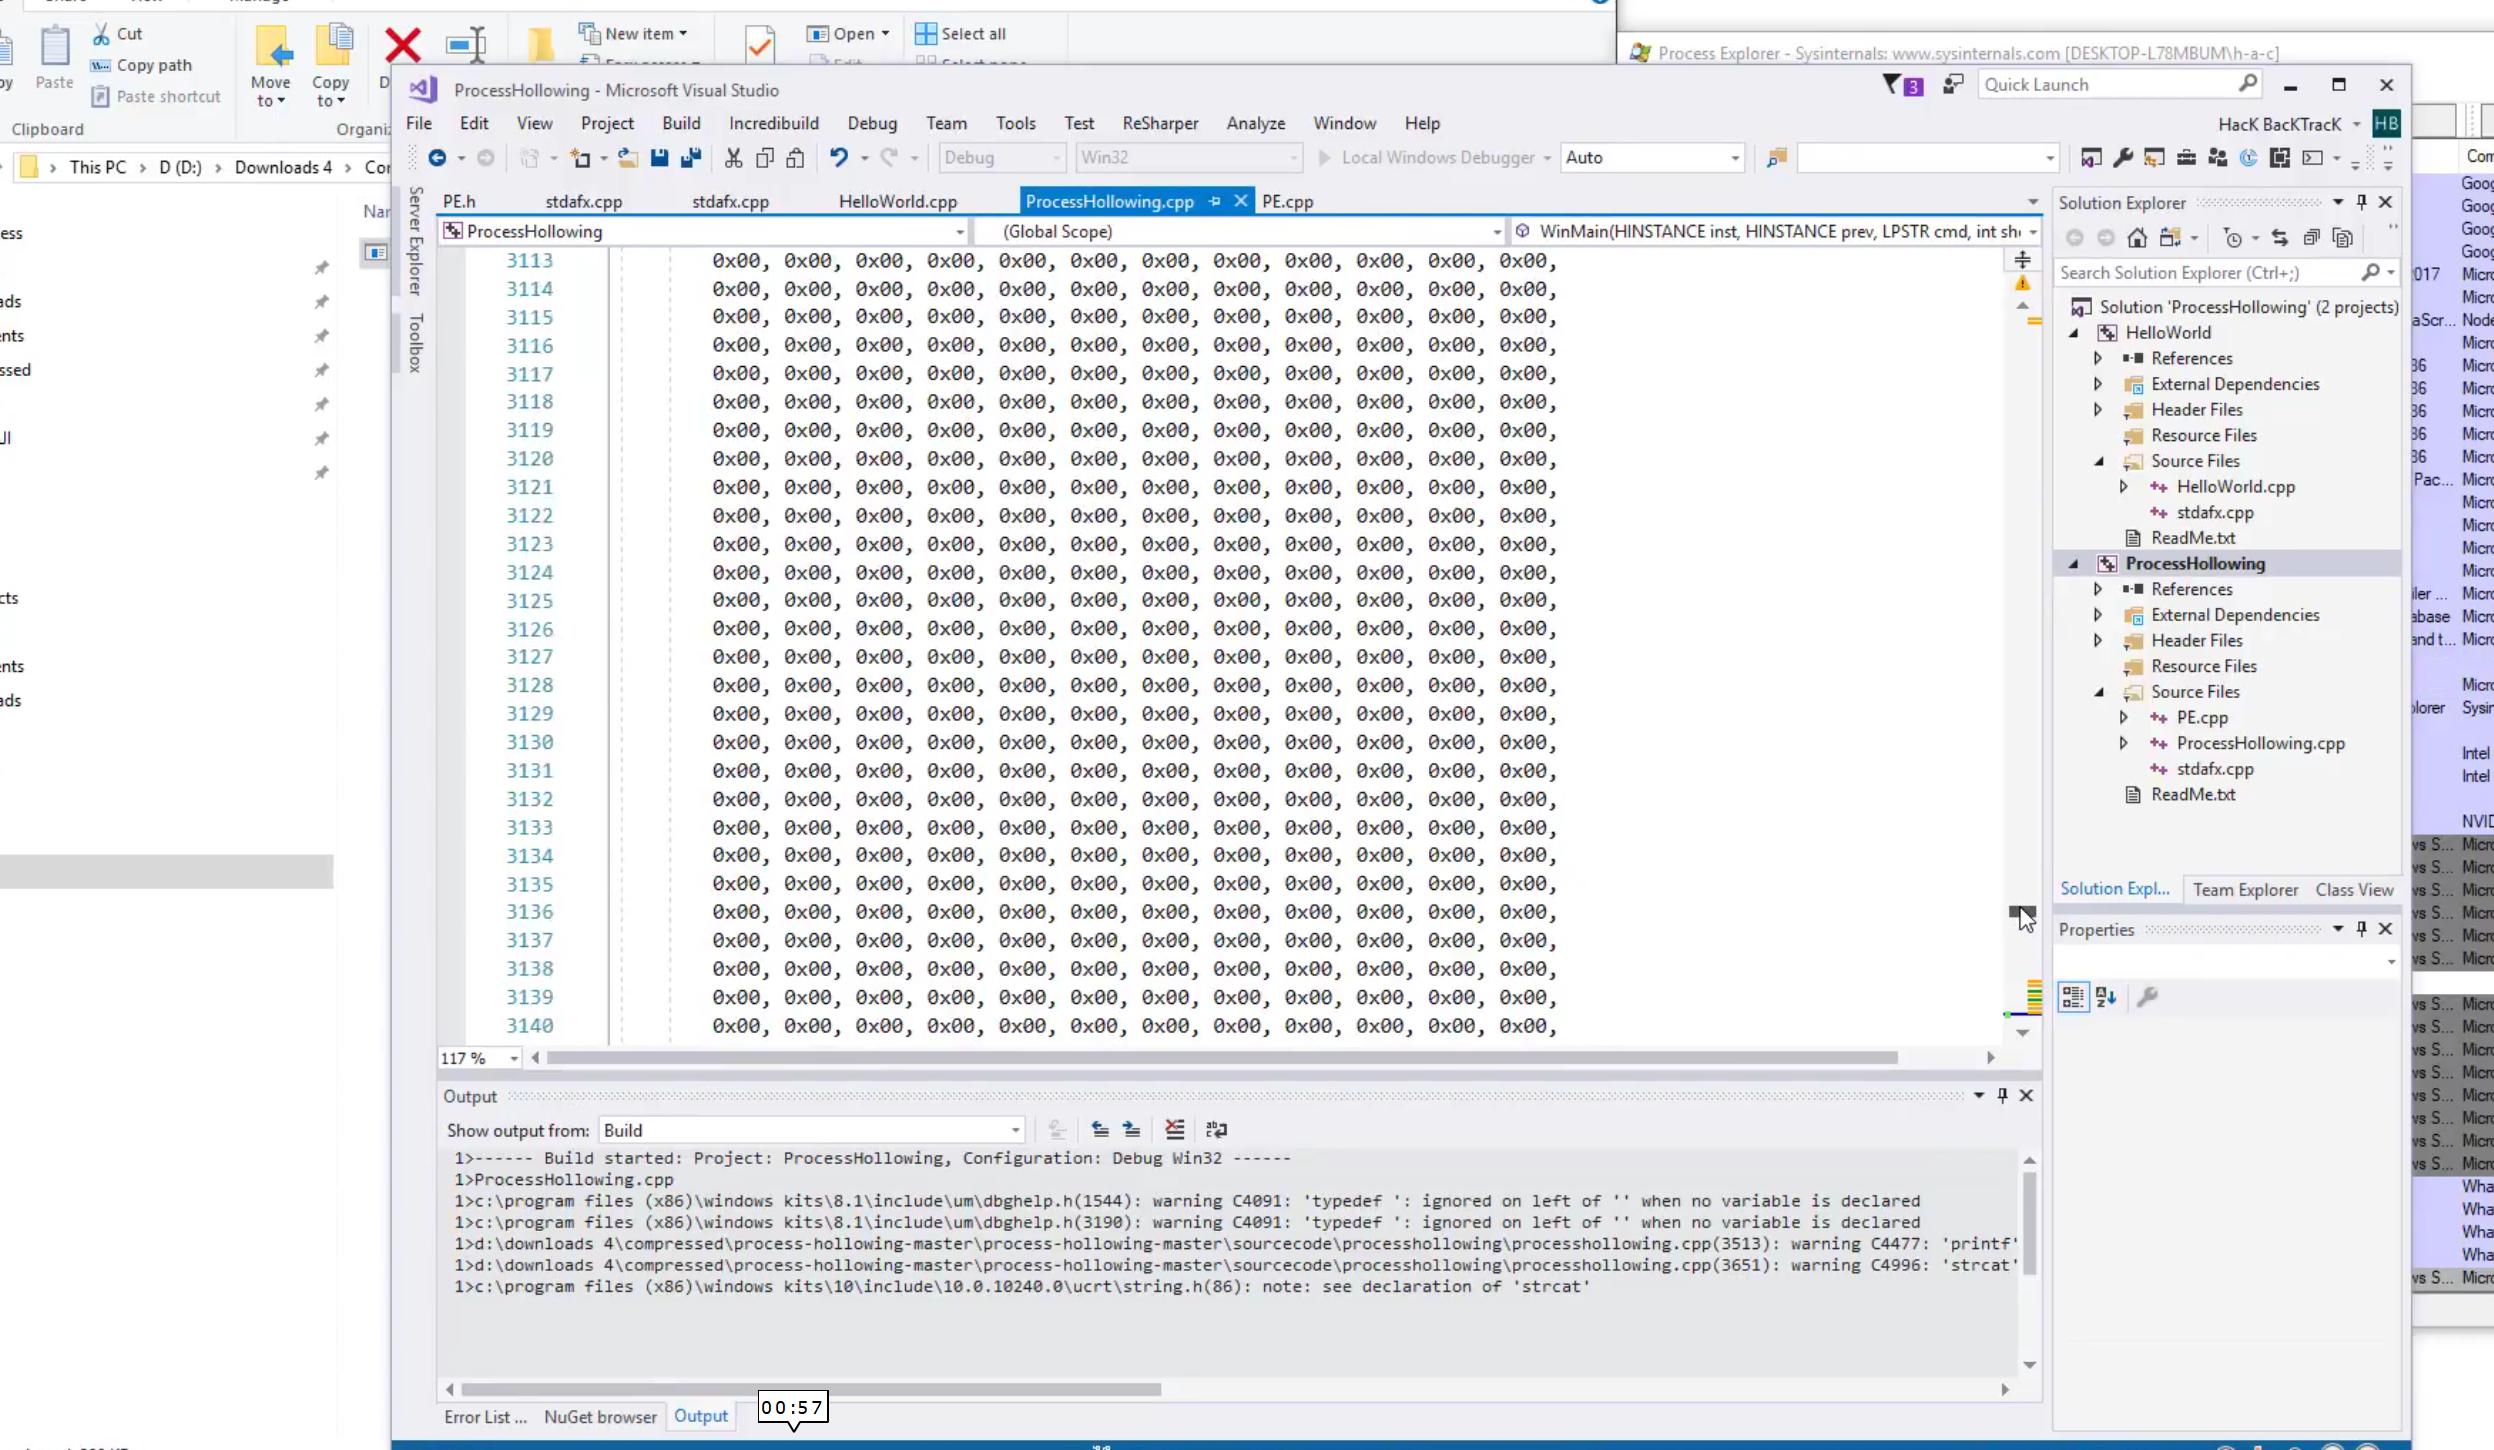 ProcessHollowing > Cpp (ٍSCR)